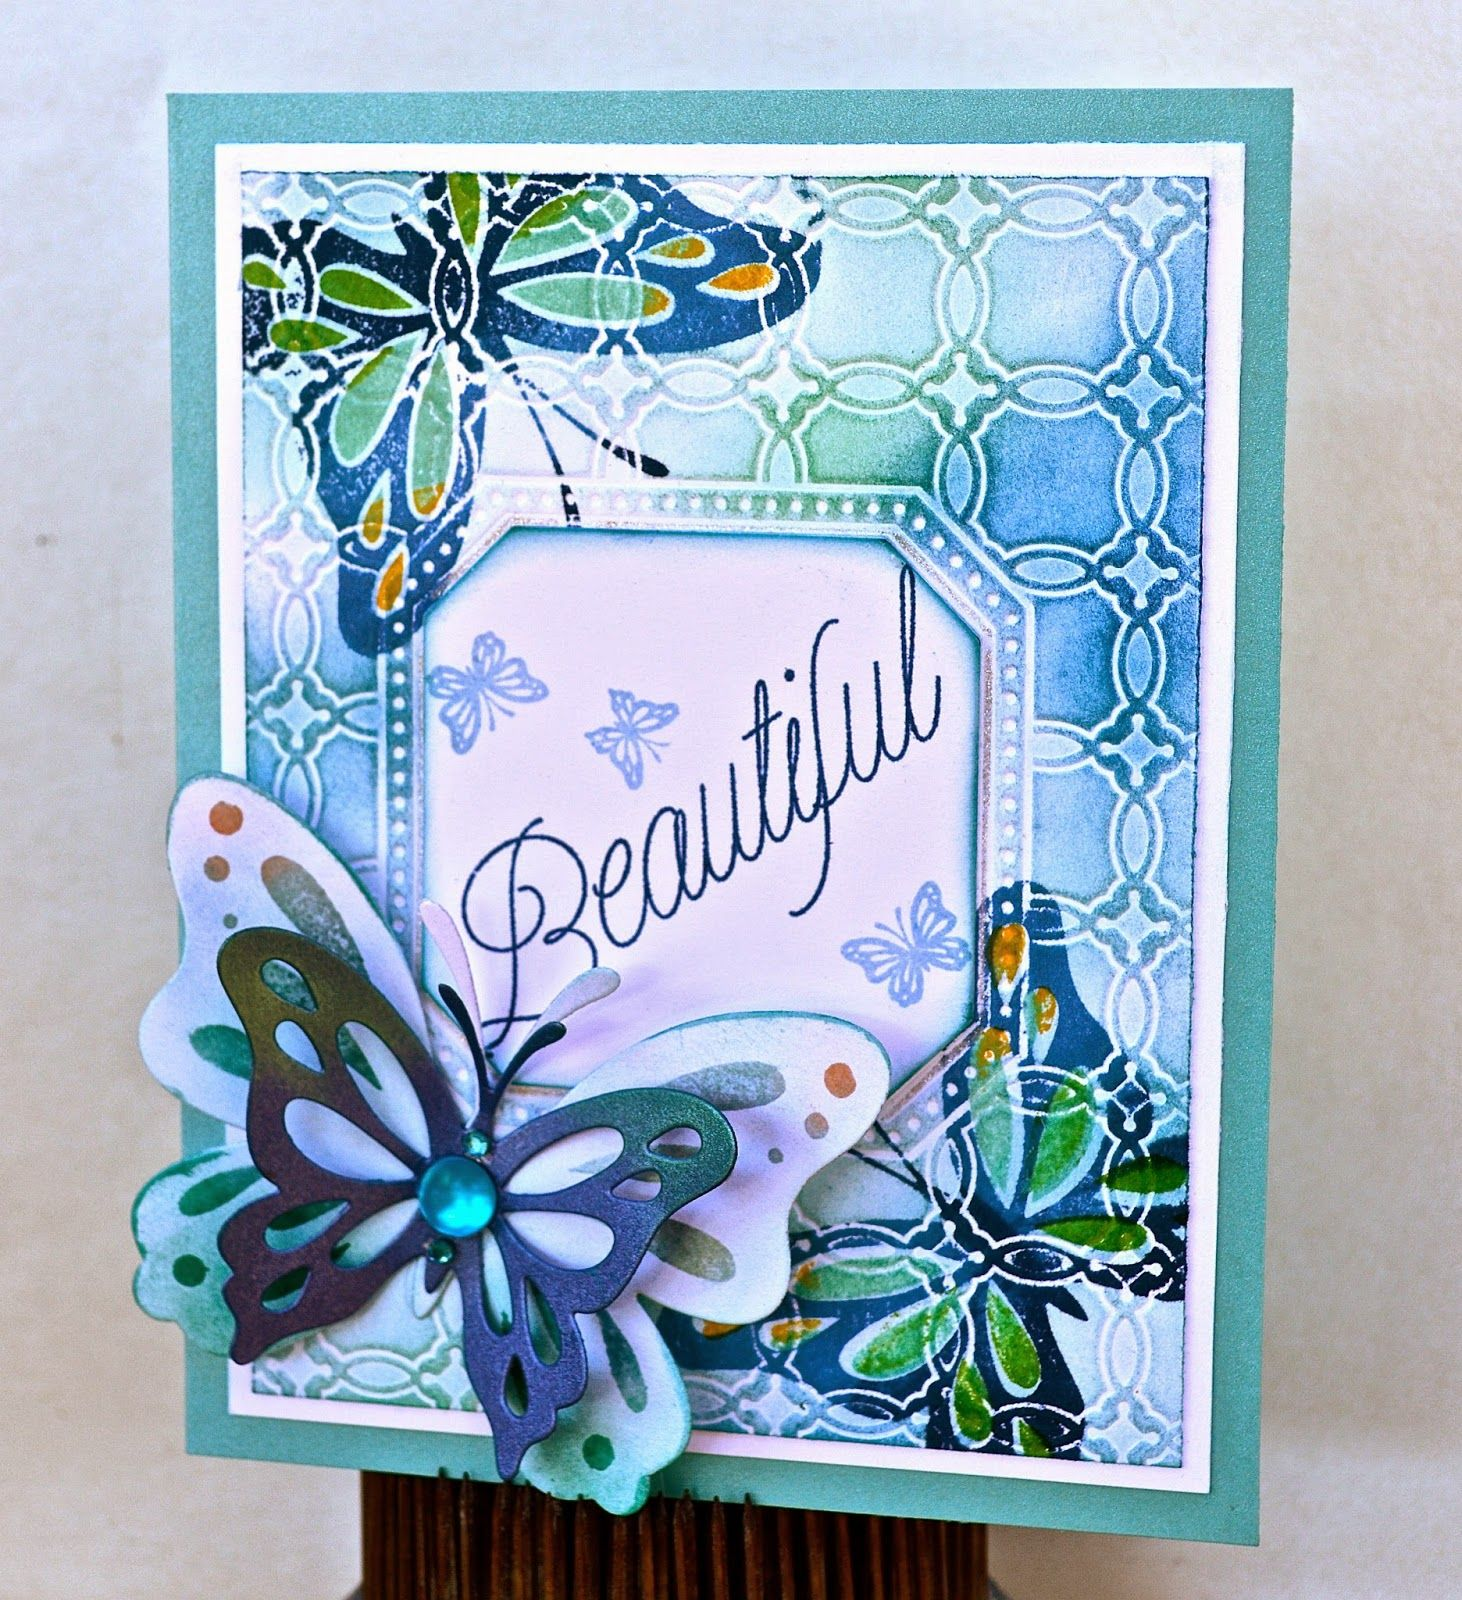 1) Embossing folder/impression plate  2) chalks  3) stamping on top of  4) embellish